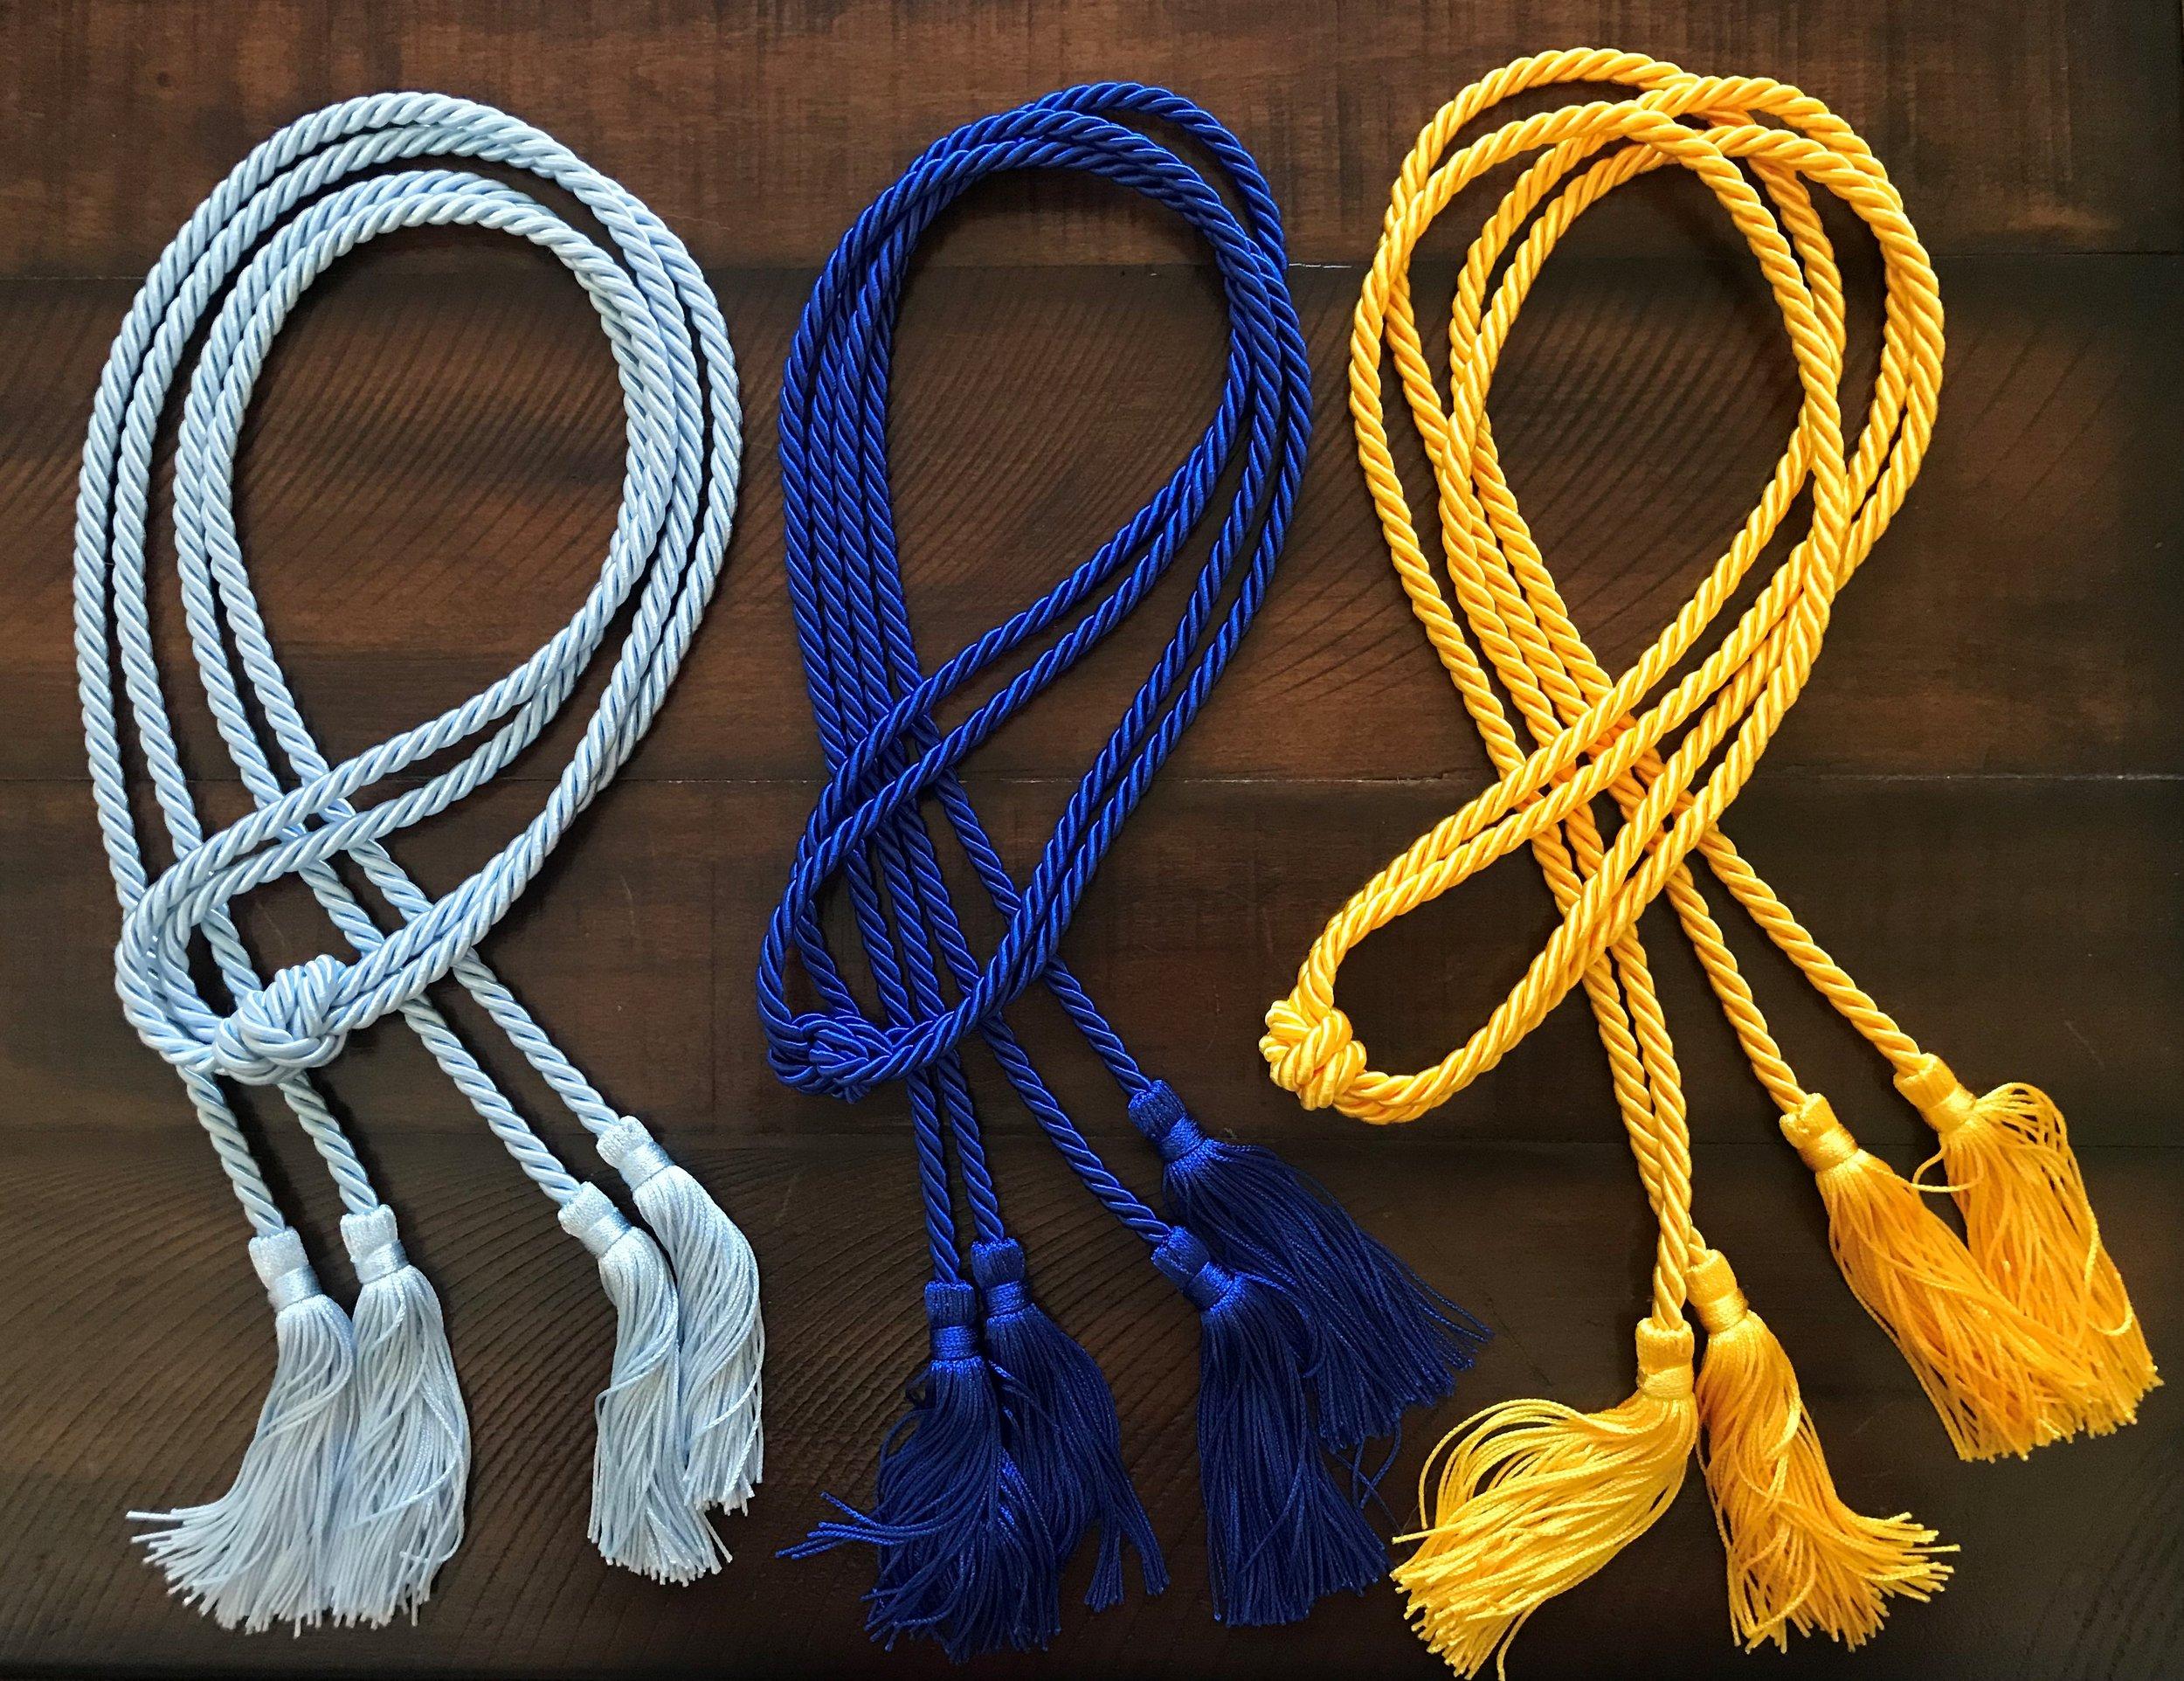 Double Cord / Single-color (Light Blue, Royal Blue, & Gold shown)